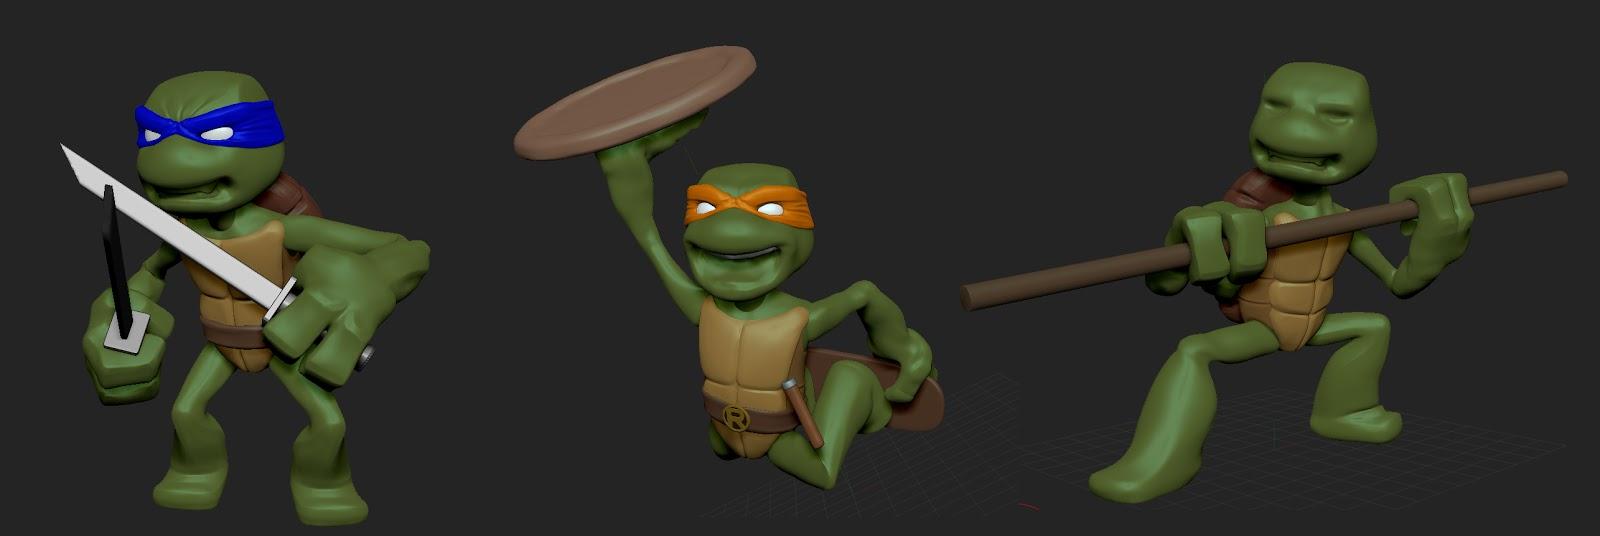 turtle%2Bprogres.jpg